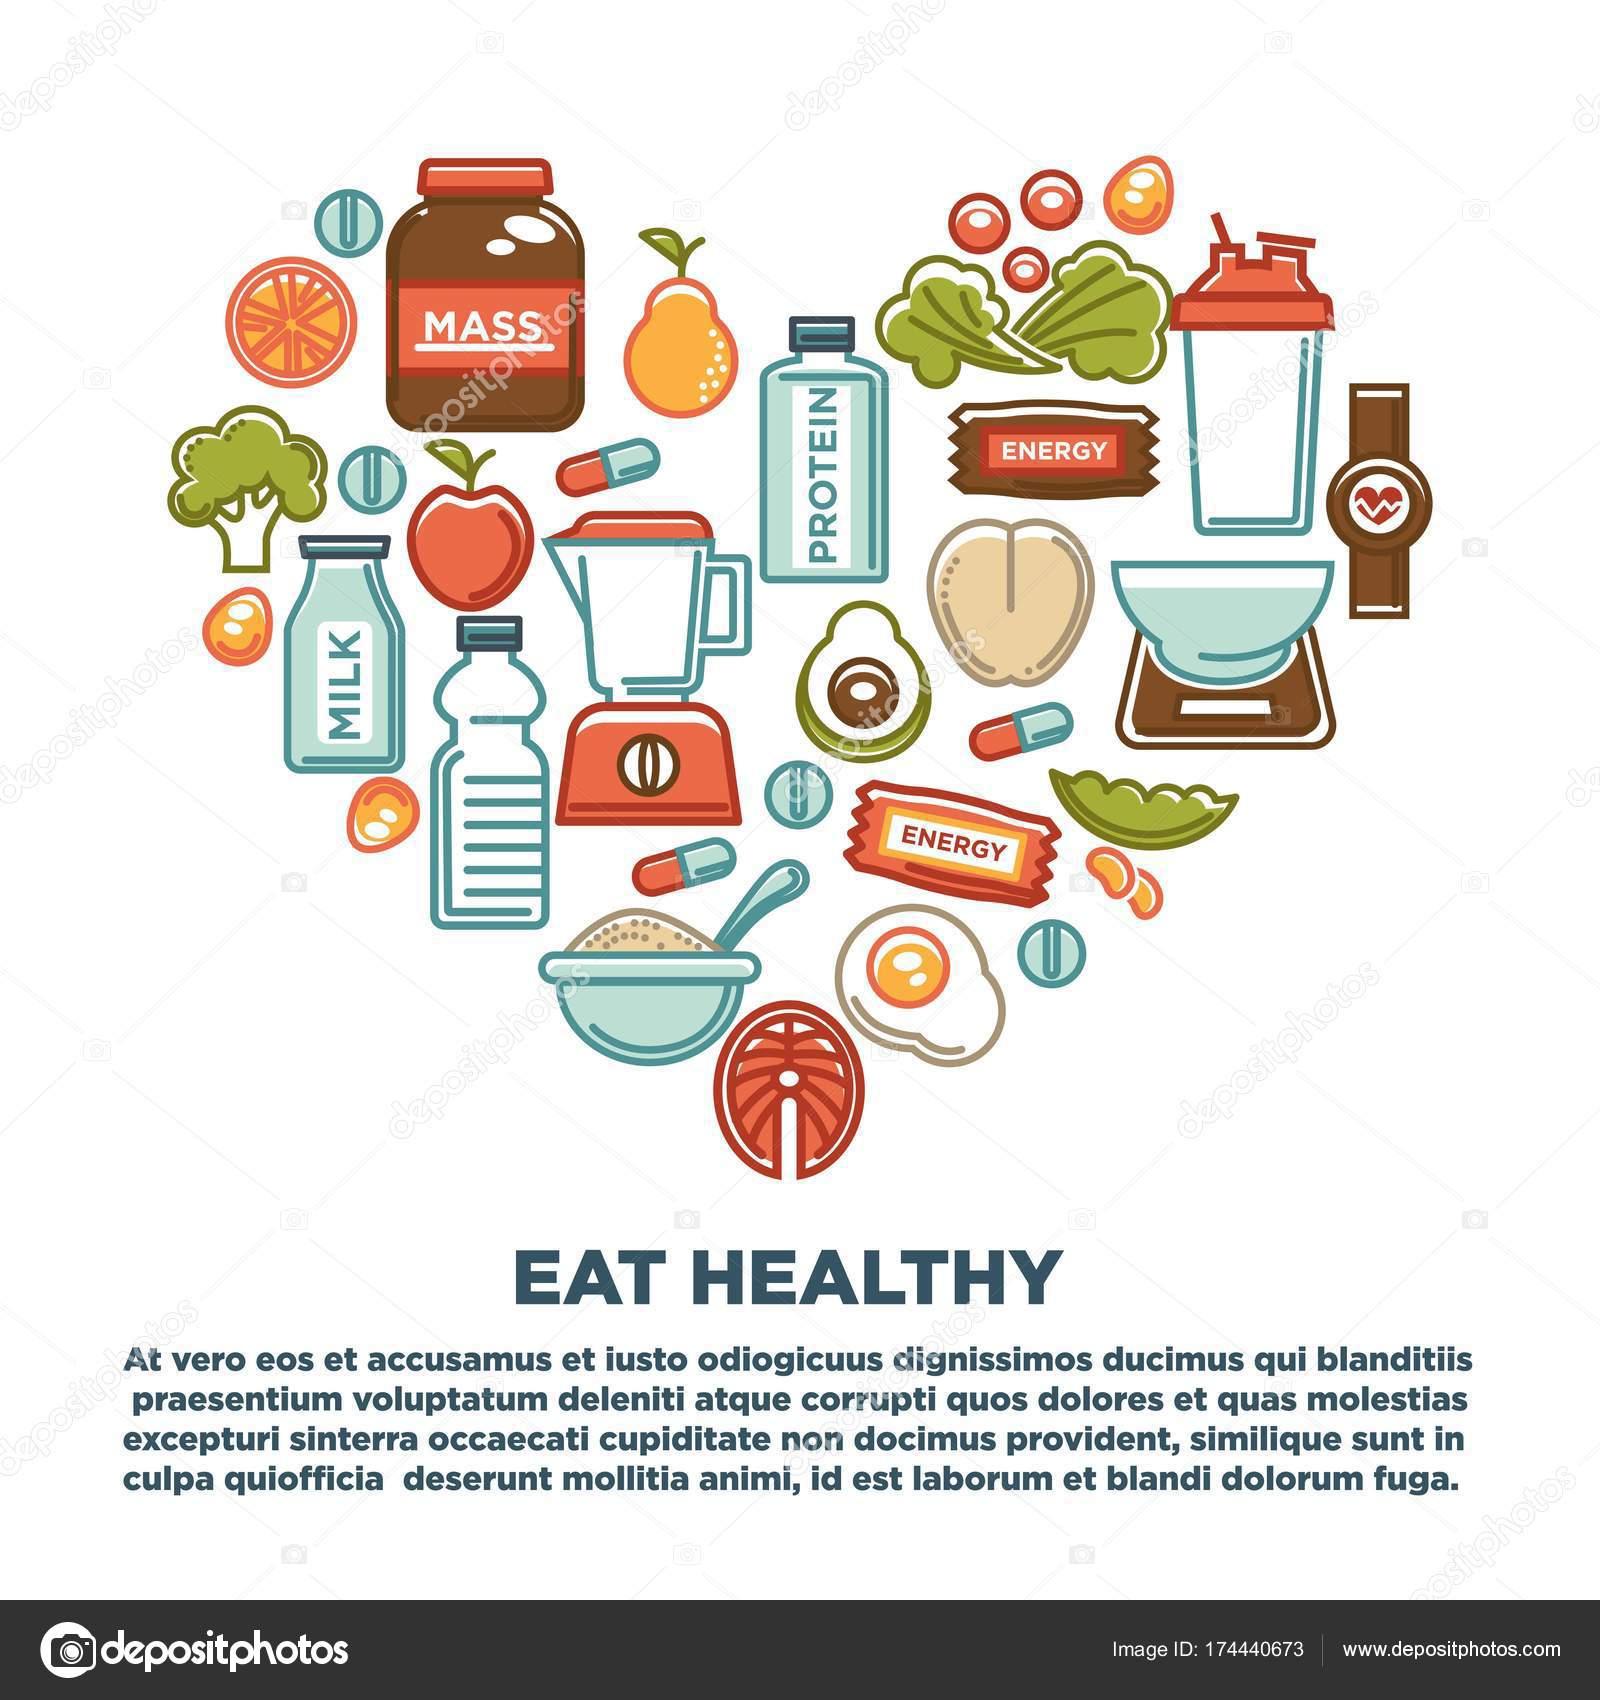 dieta energetica e sana